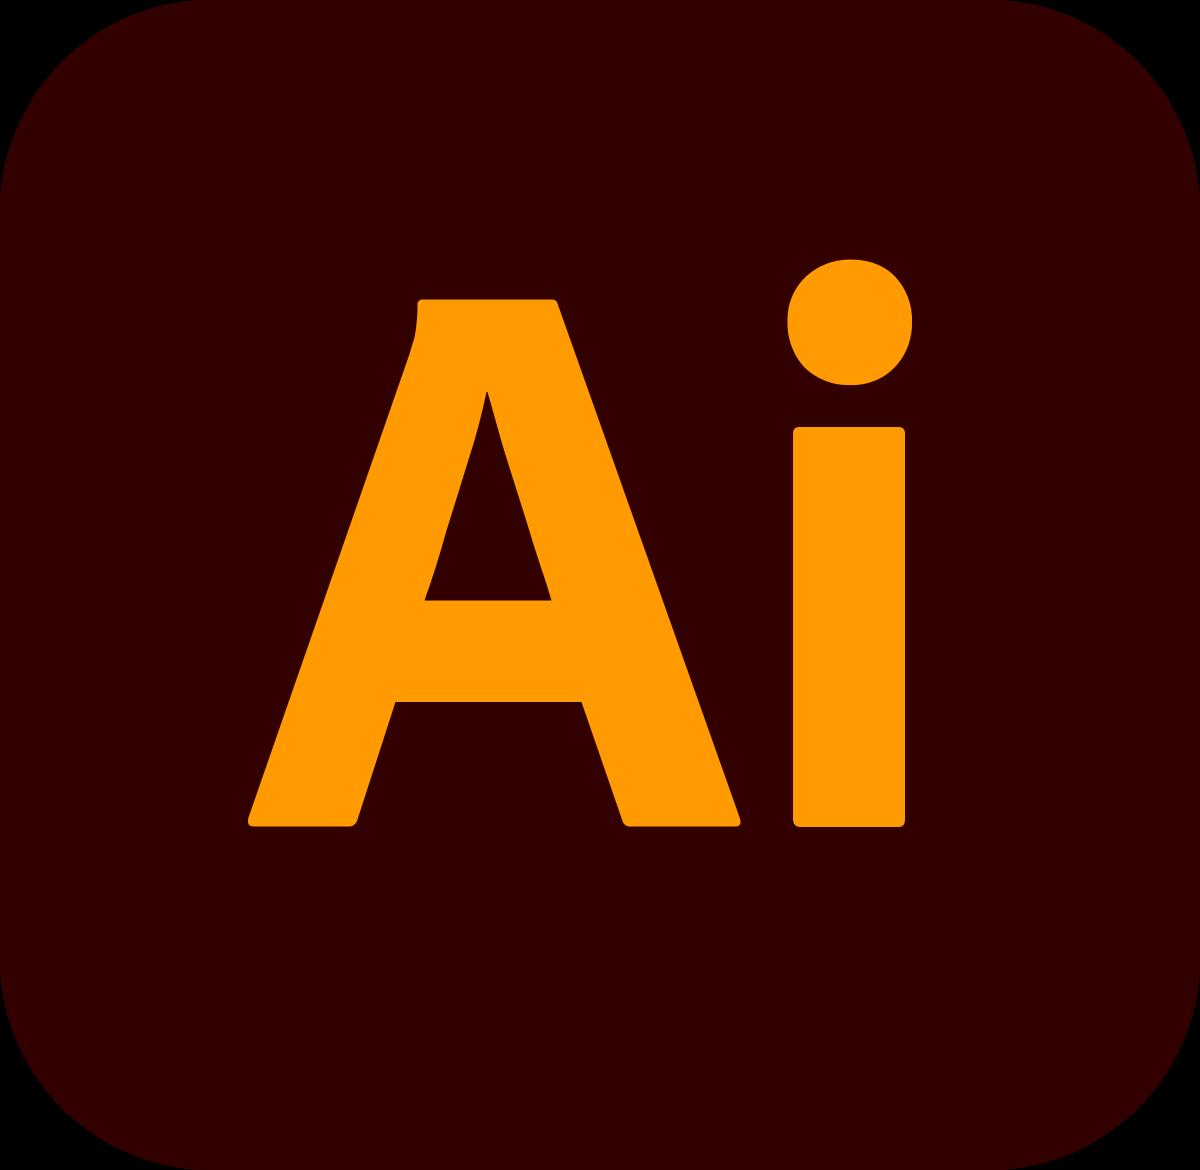 Adobe Illustrator CC 2021 v25.3.1.390 Full version